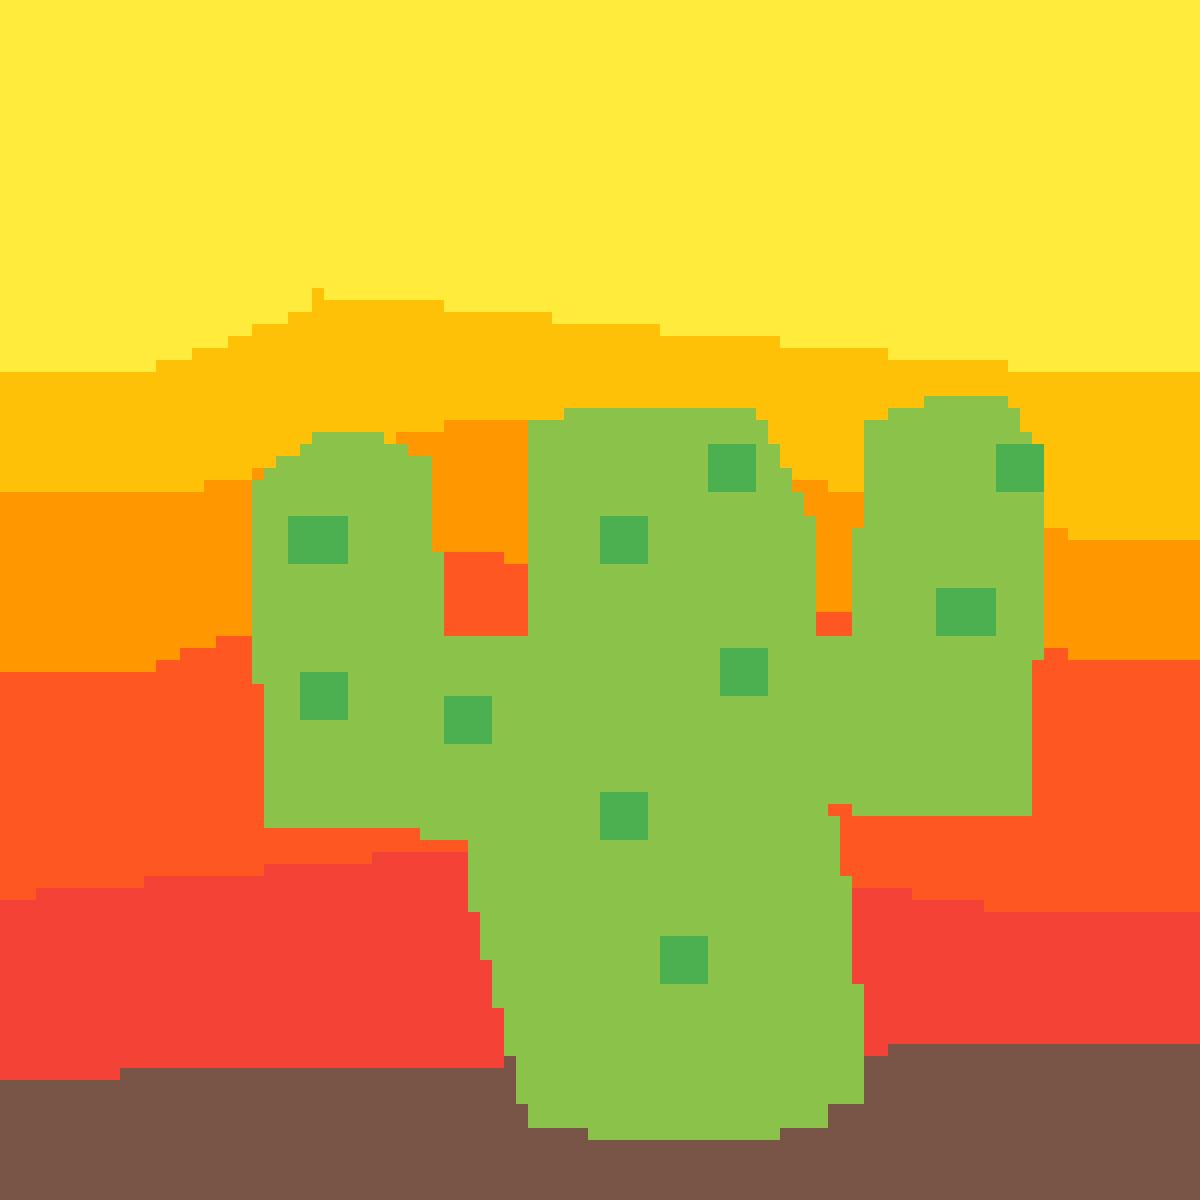 Cactus by Felixunicorn137